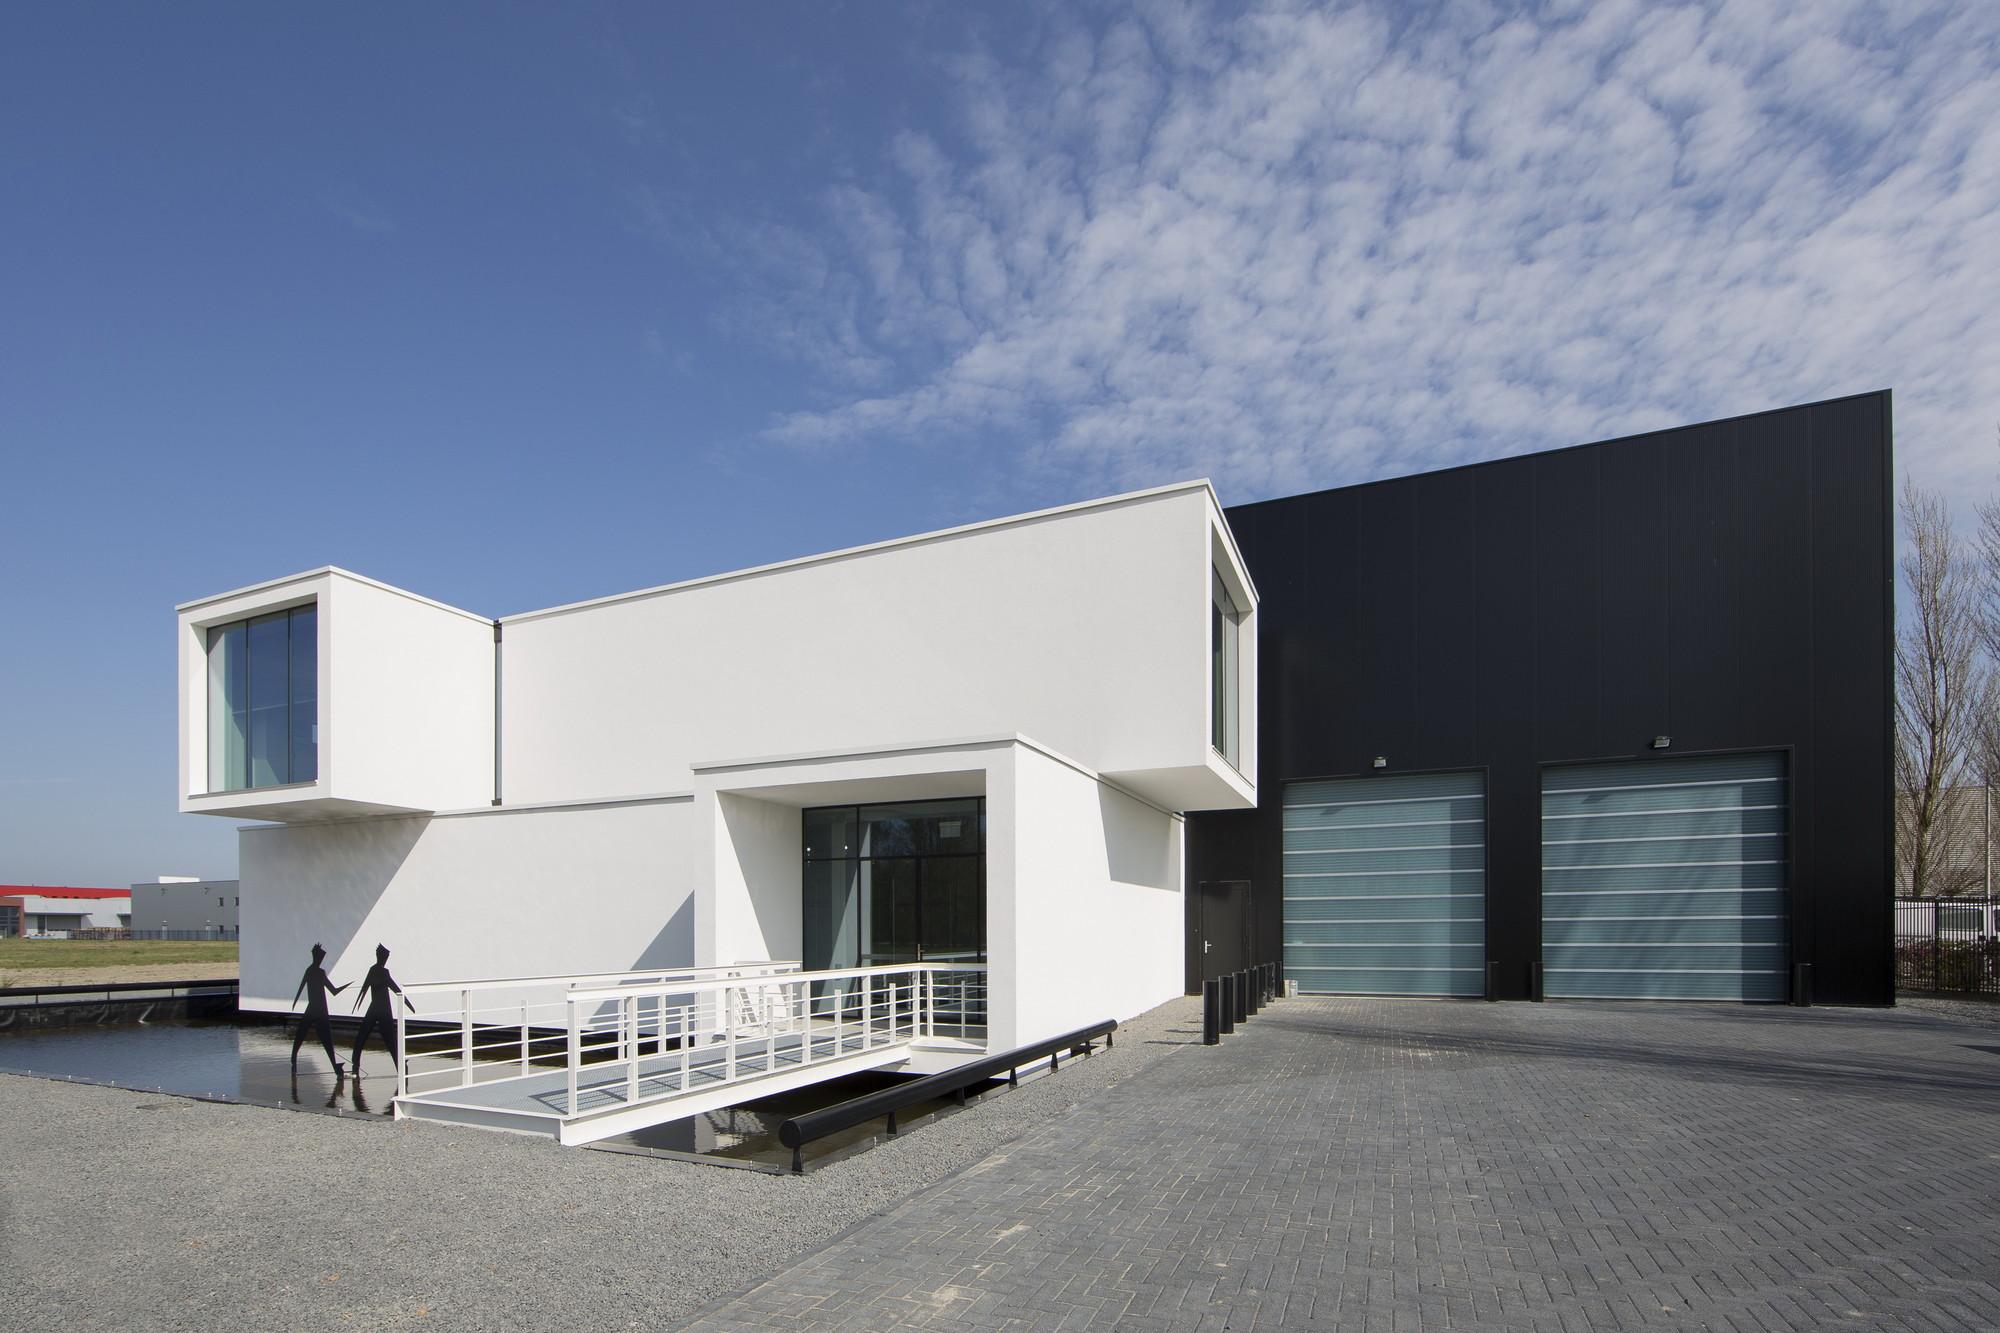 Sanibell / RoosRos Architecten, © P. Kamp